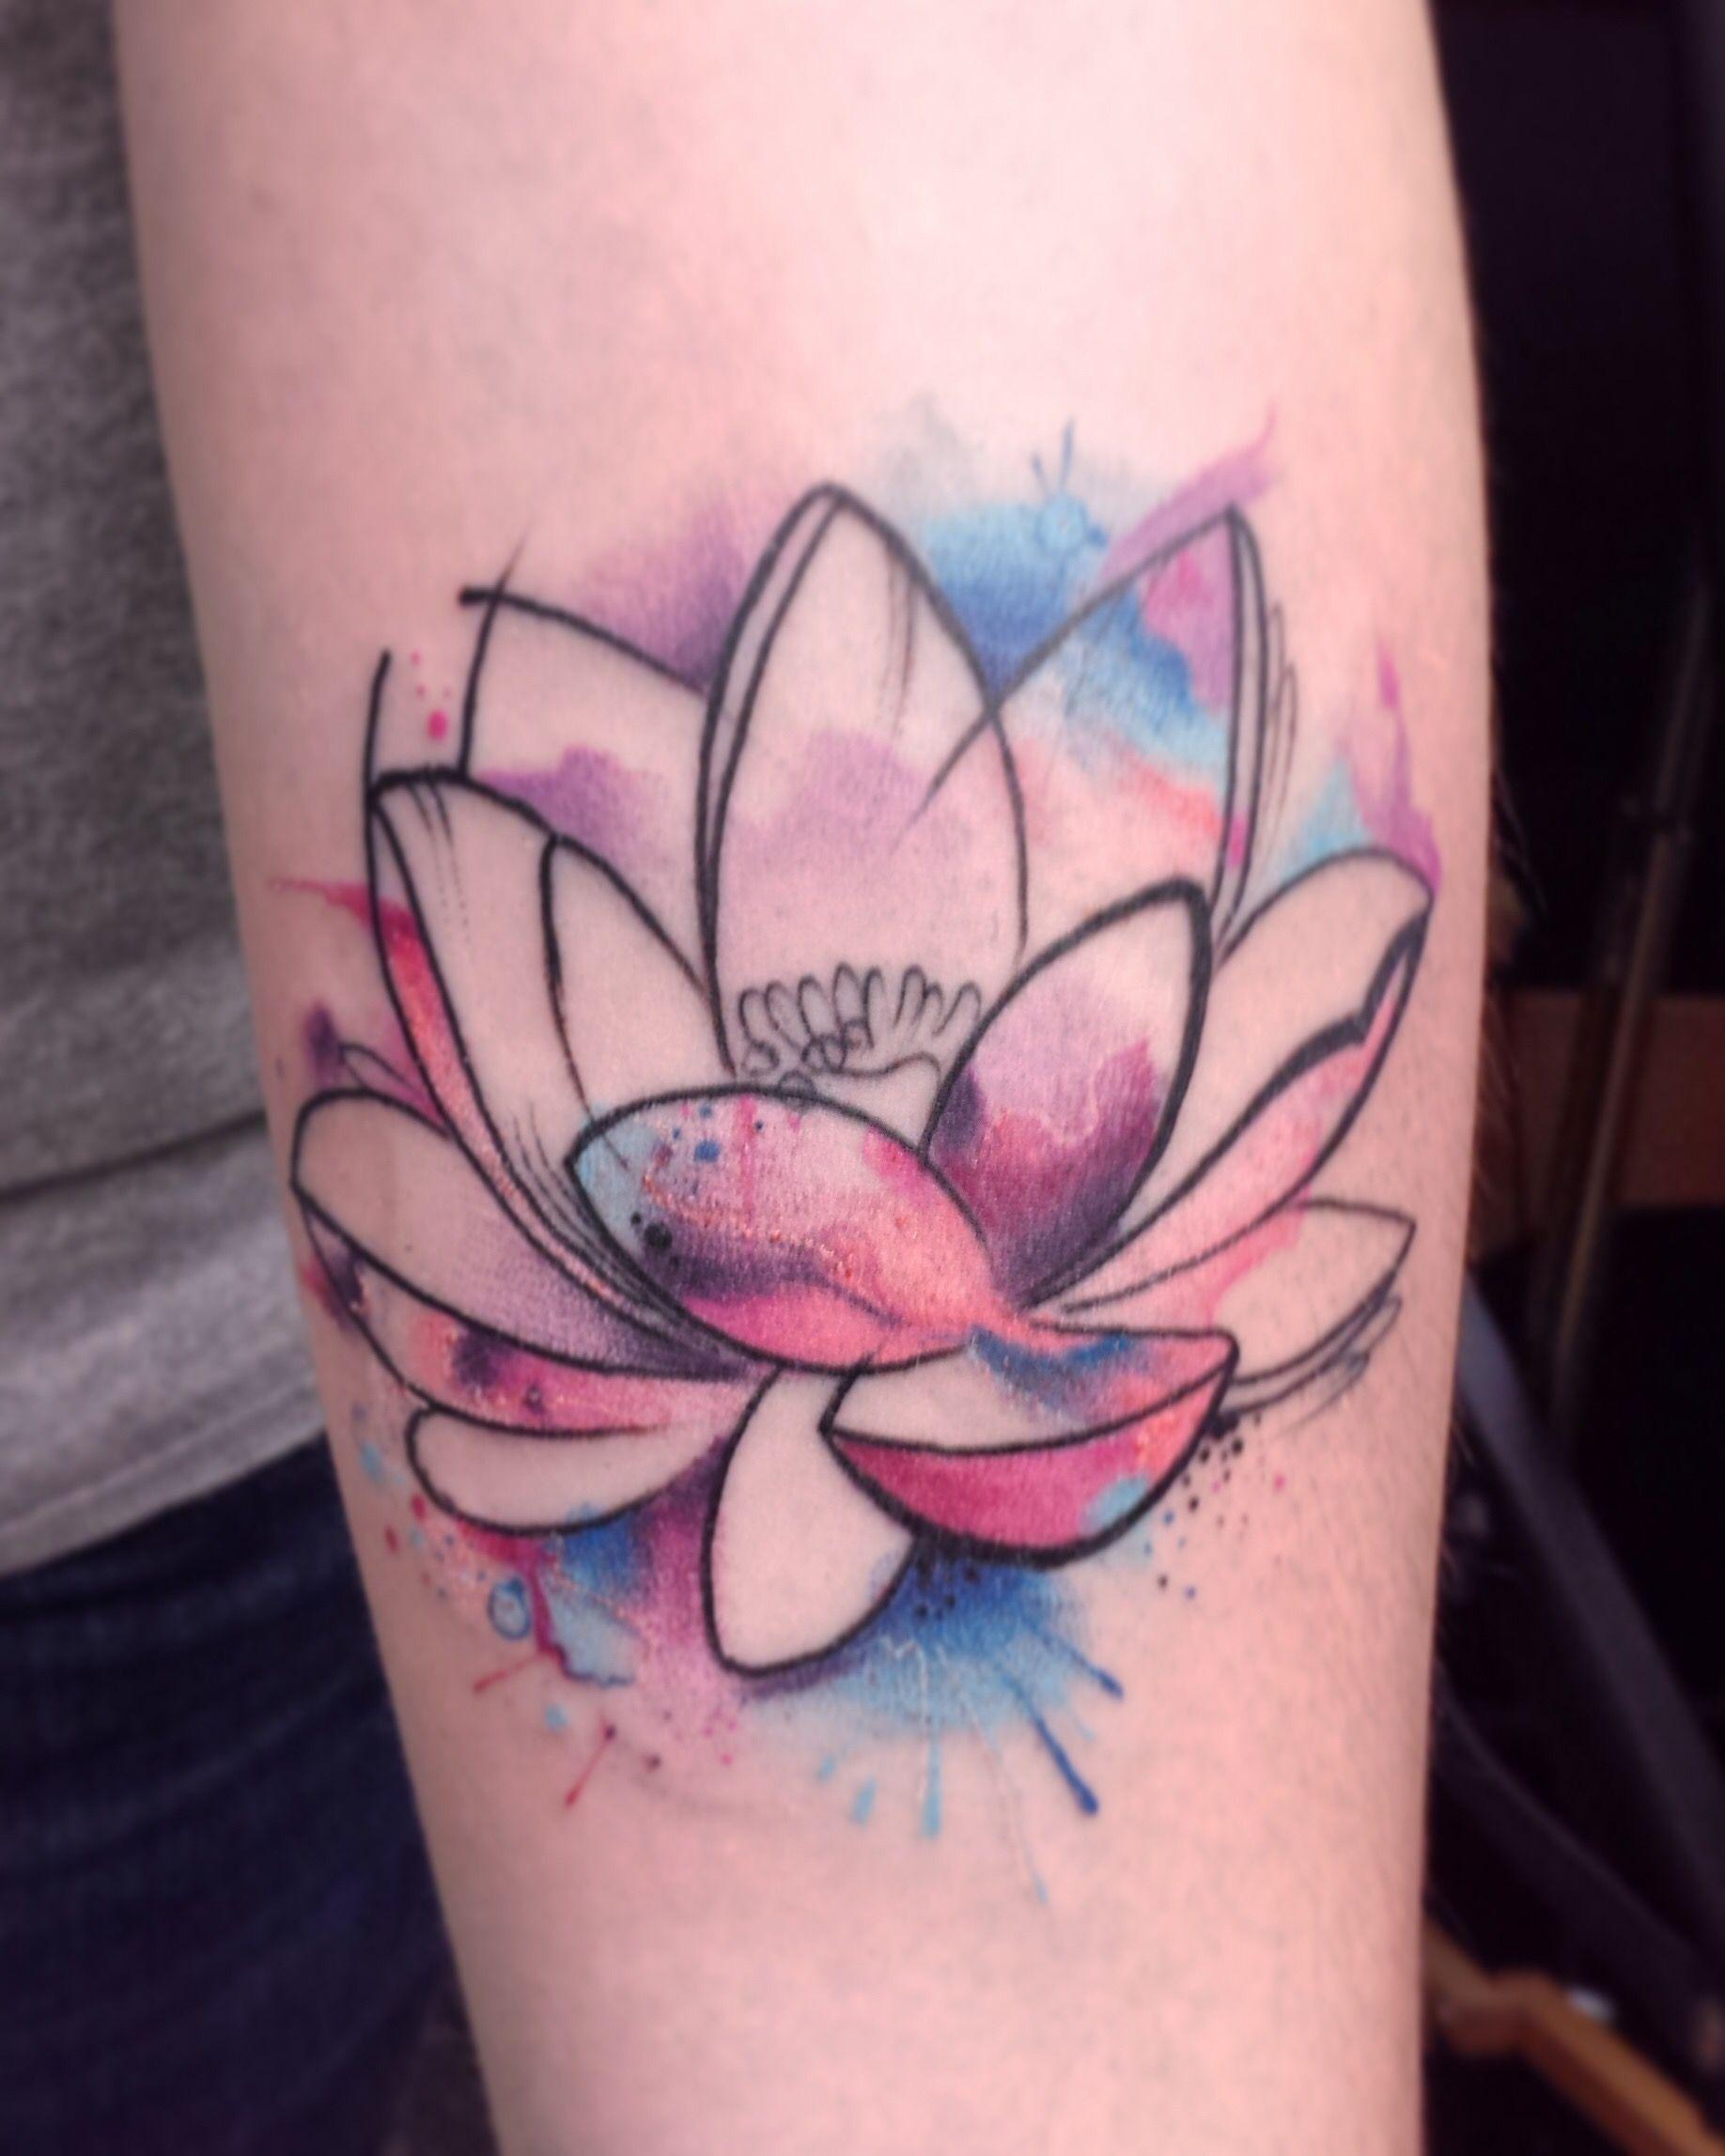 Pin By Ariana Long On Tattoo Ideas Pinterest Tattoo Piercings